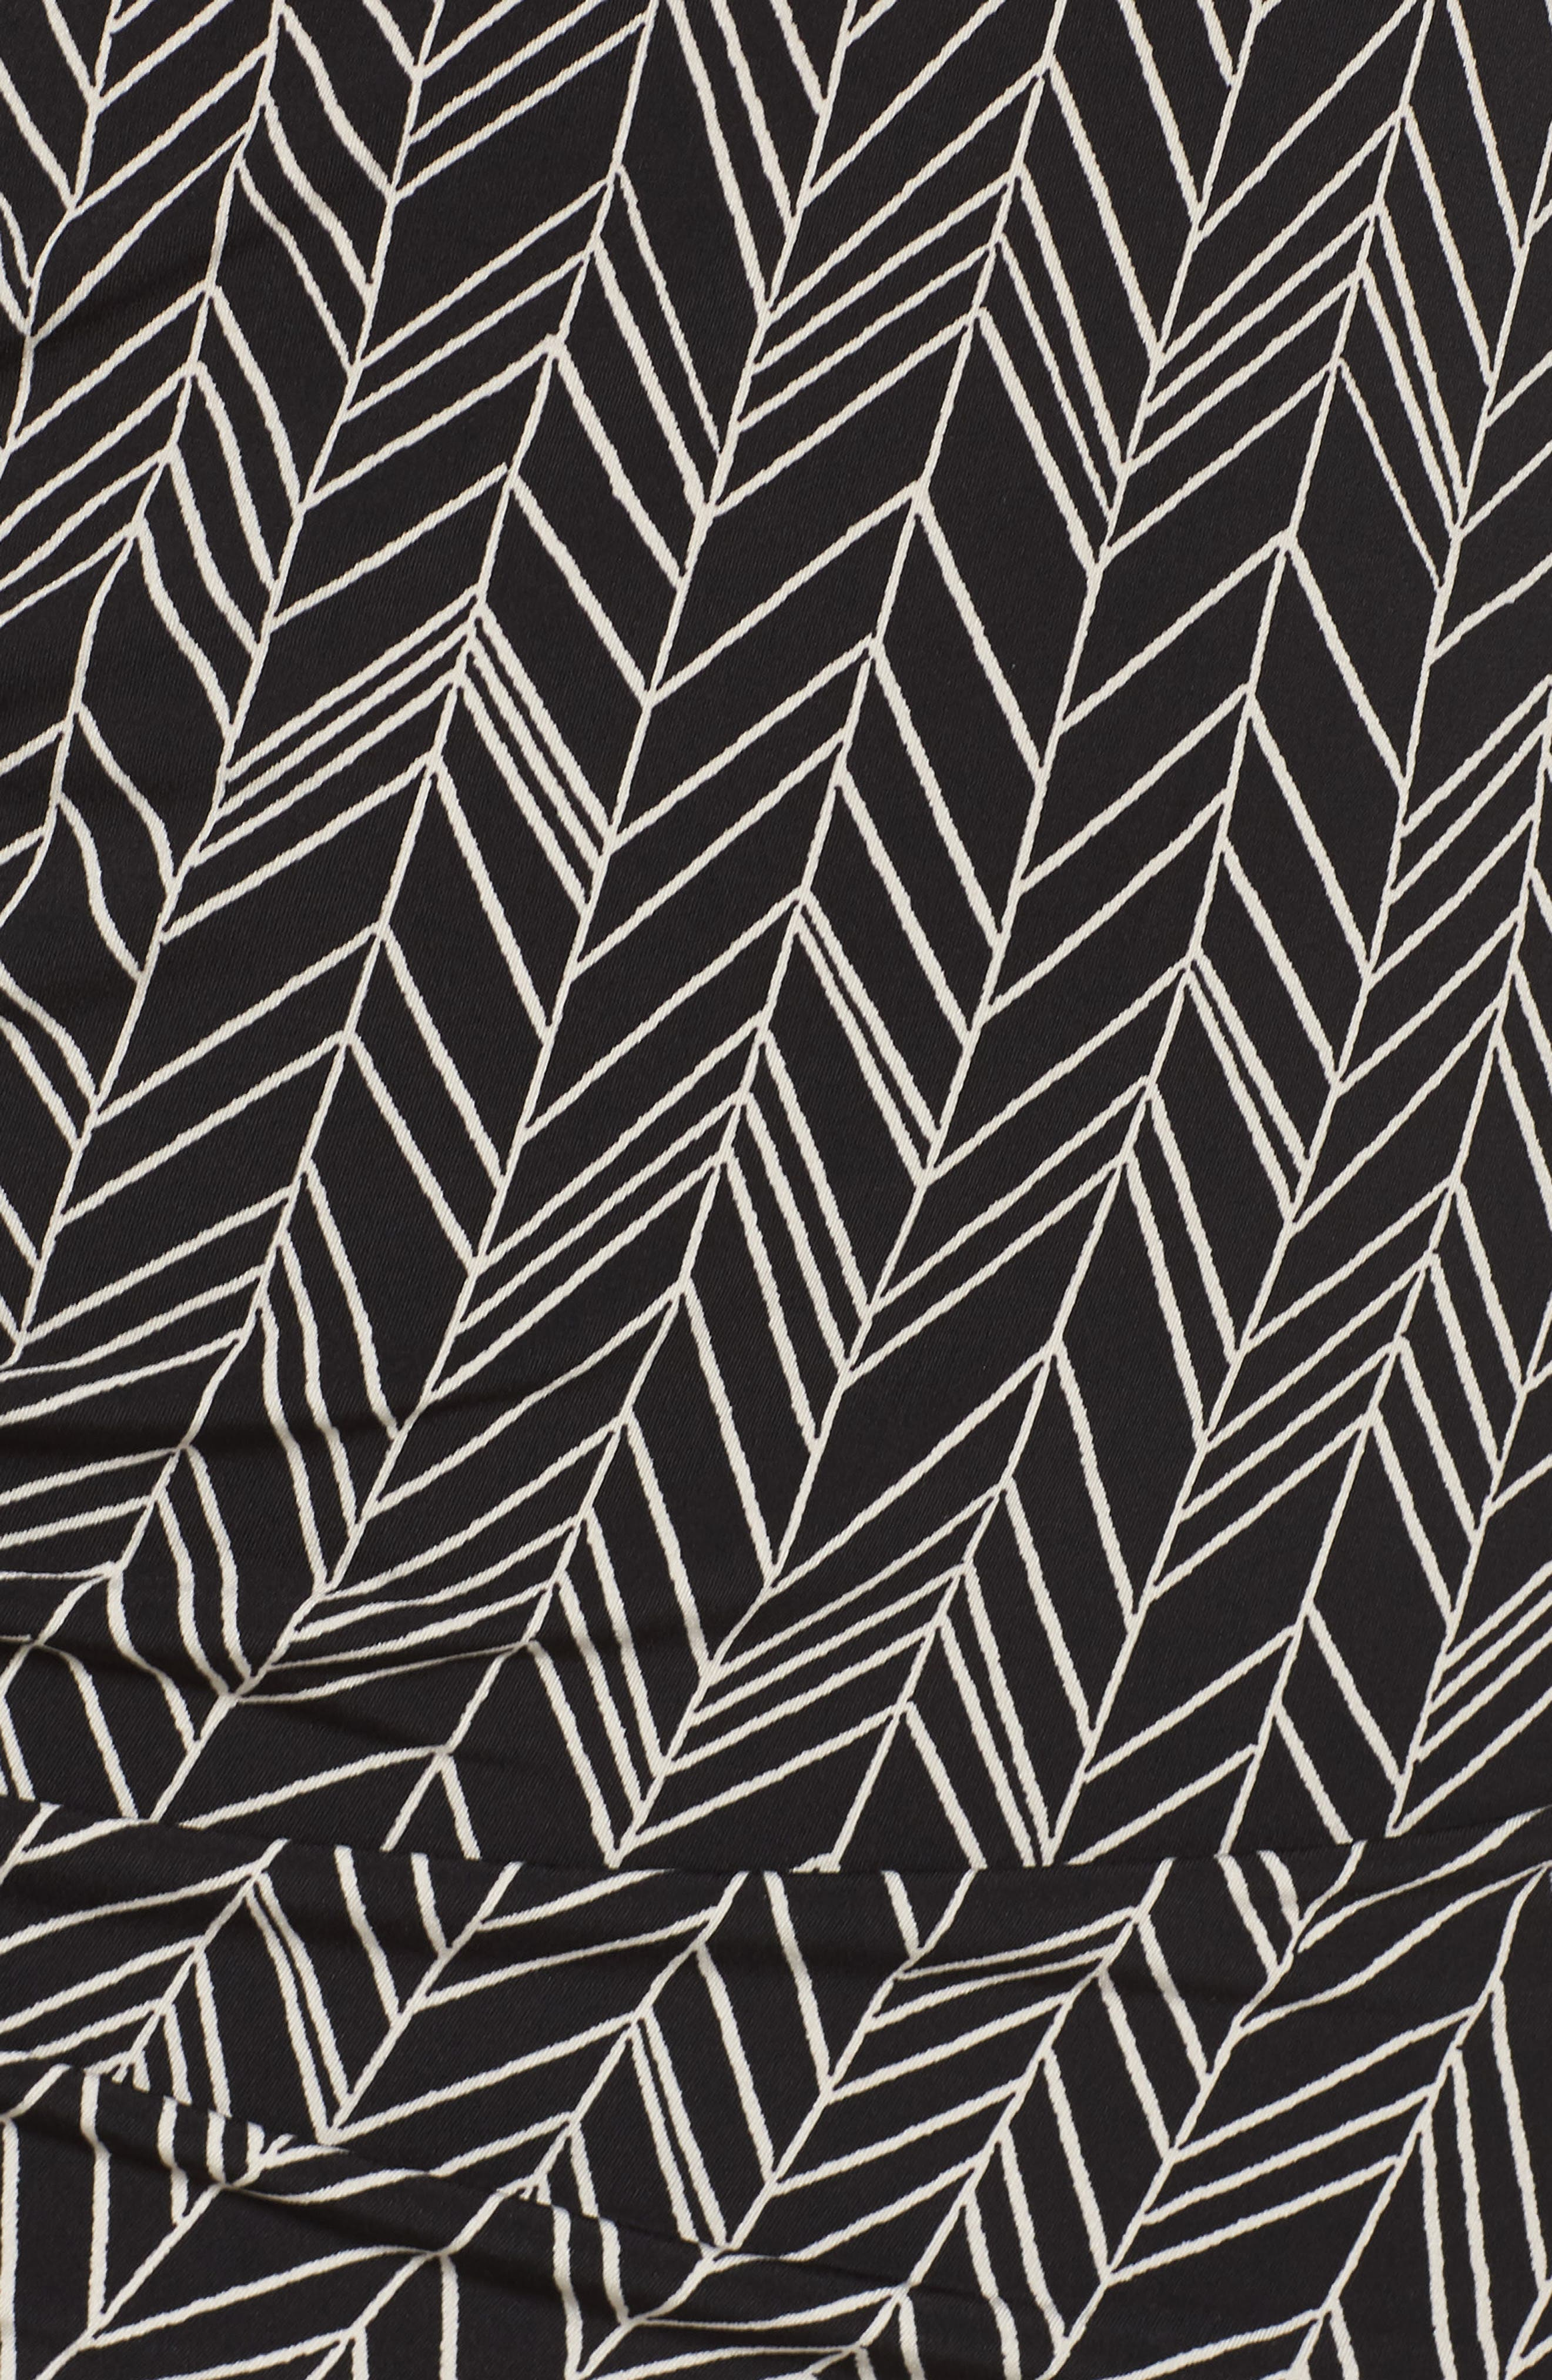 Herringbone Vine Tank,                             Alternate thumbnail 5, color,                             Rich Black